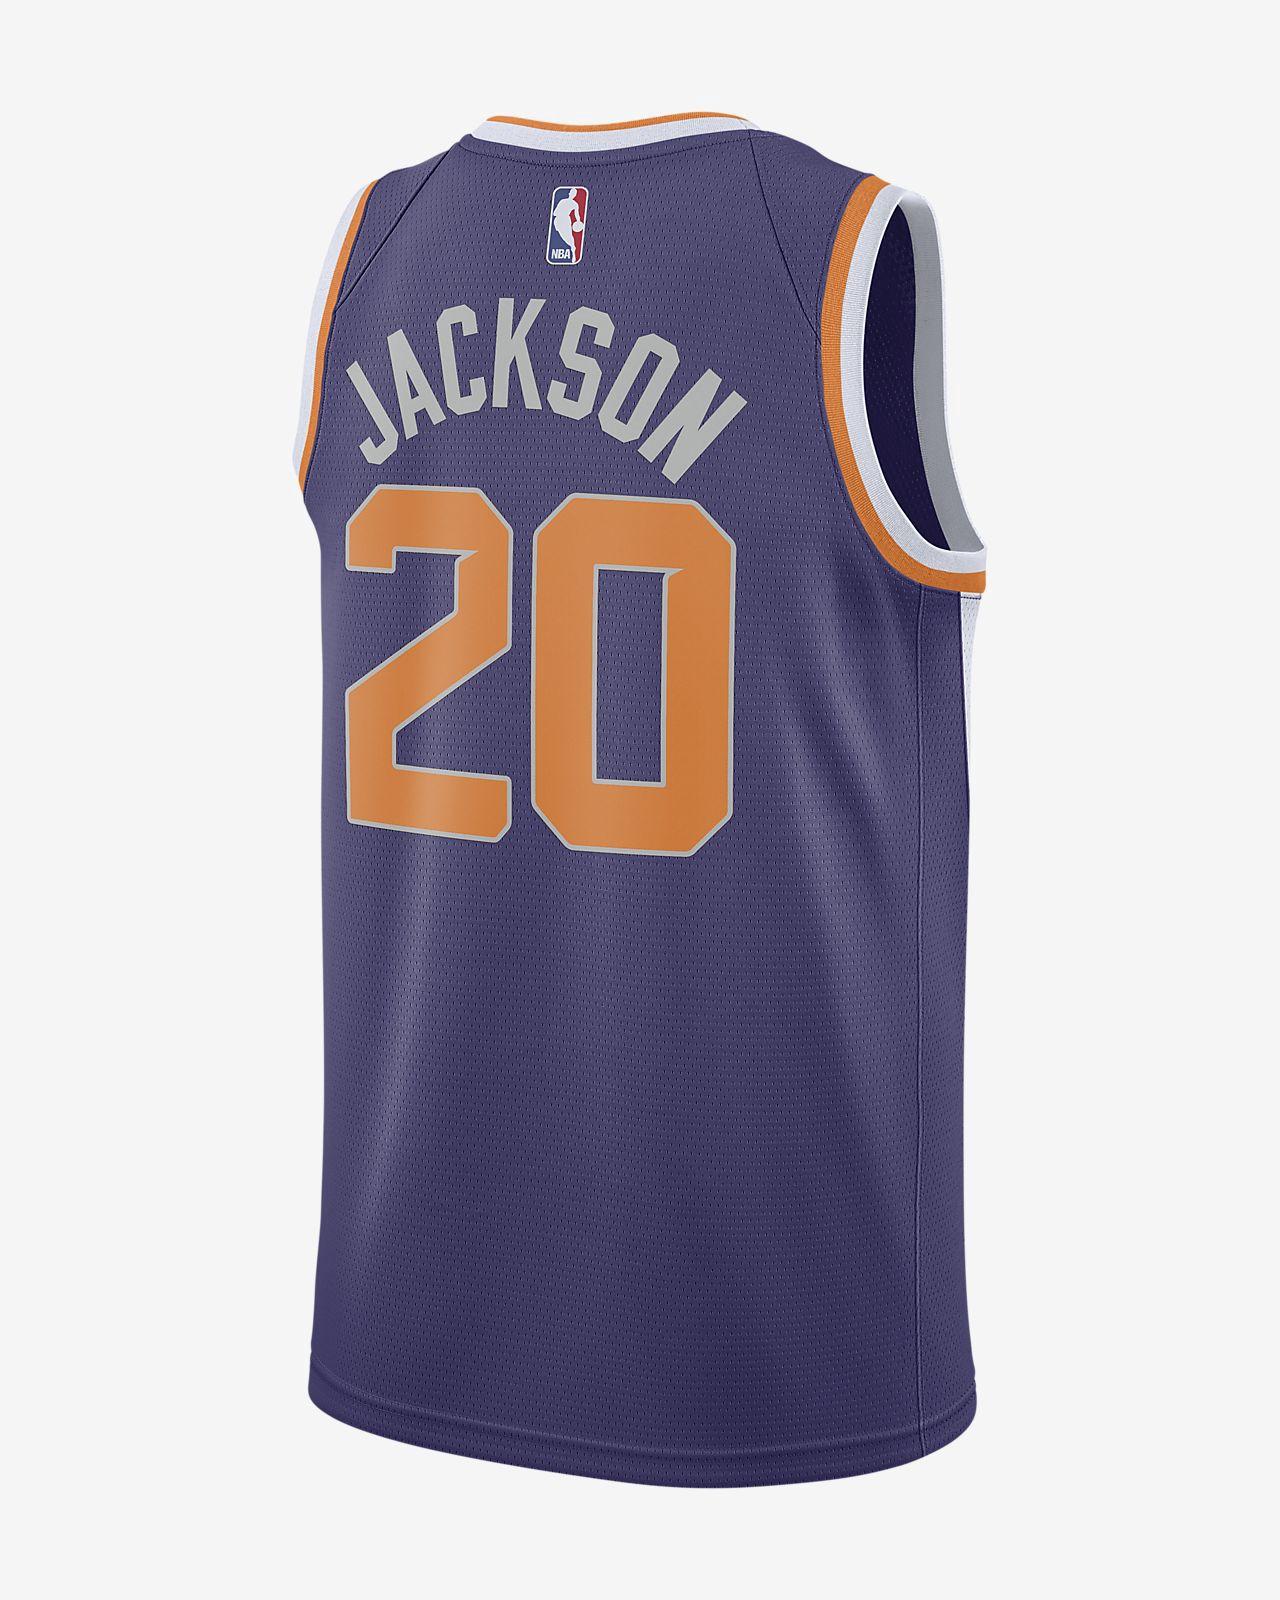 pretty nice d0feb 4c10e Nike Josh Jackson Icon Edition Swingman Jersey (Phoenix Suns ...